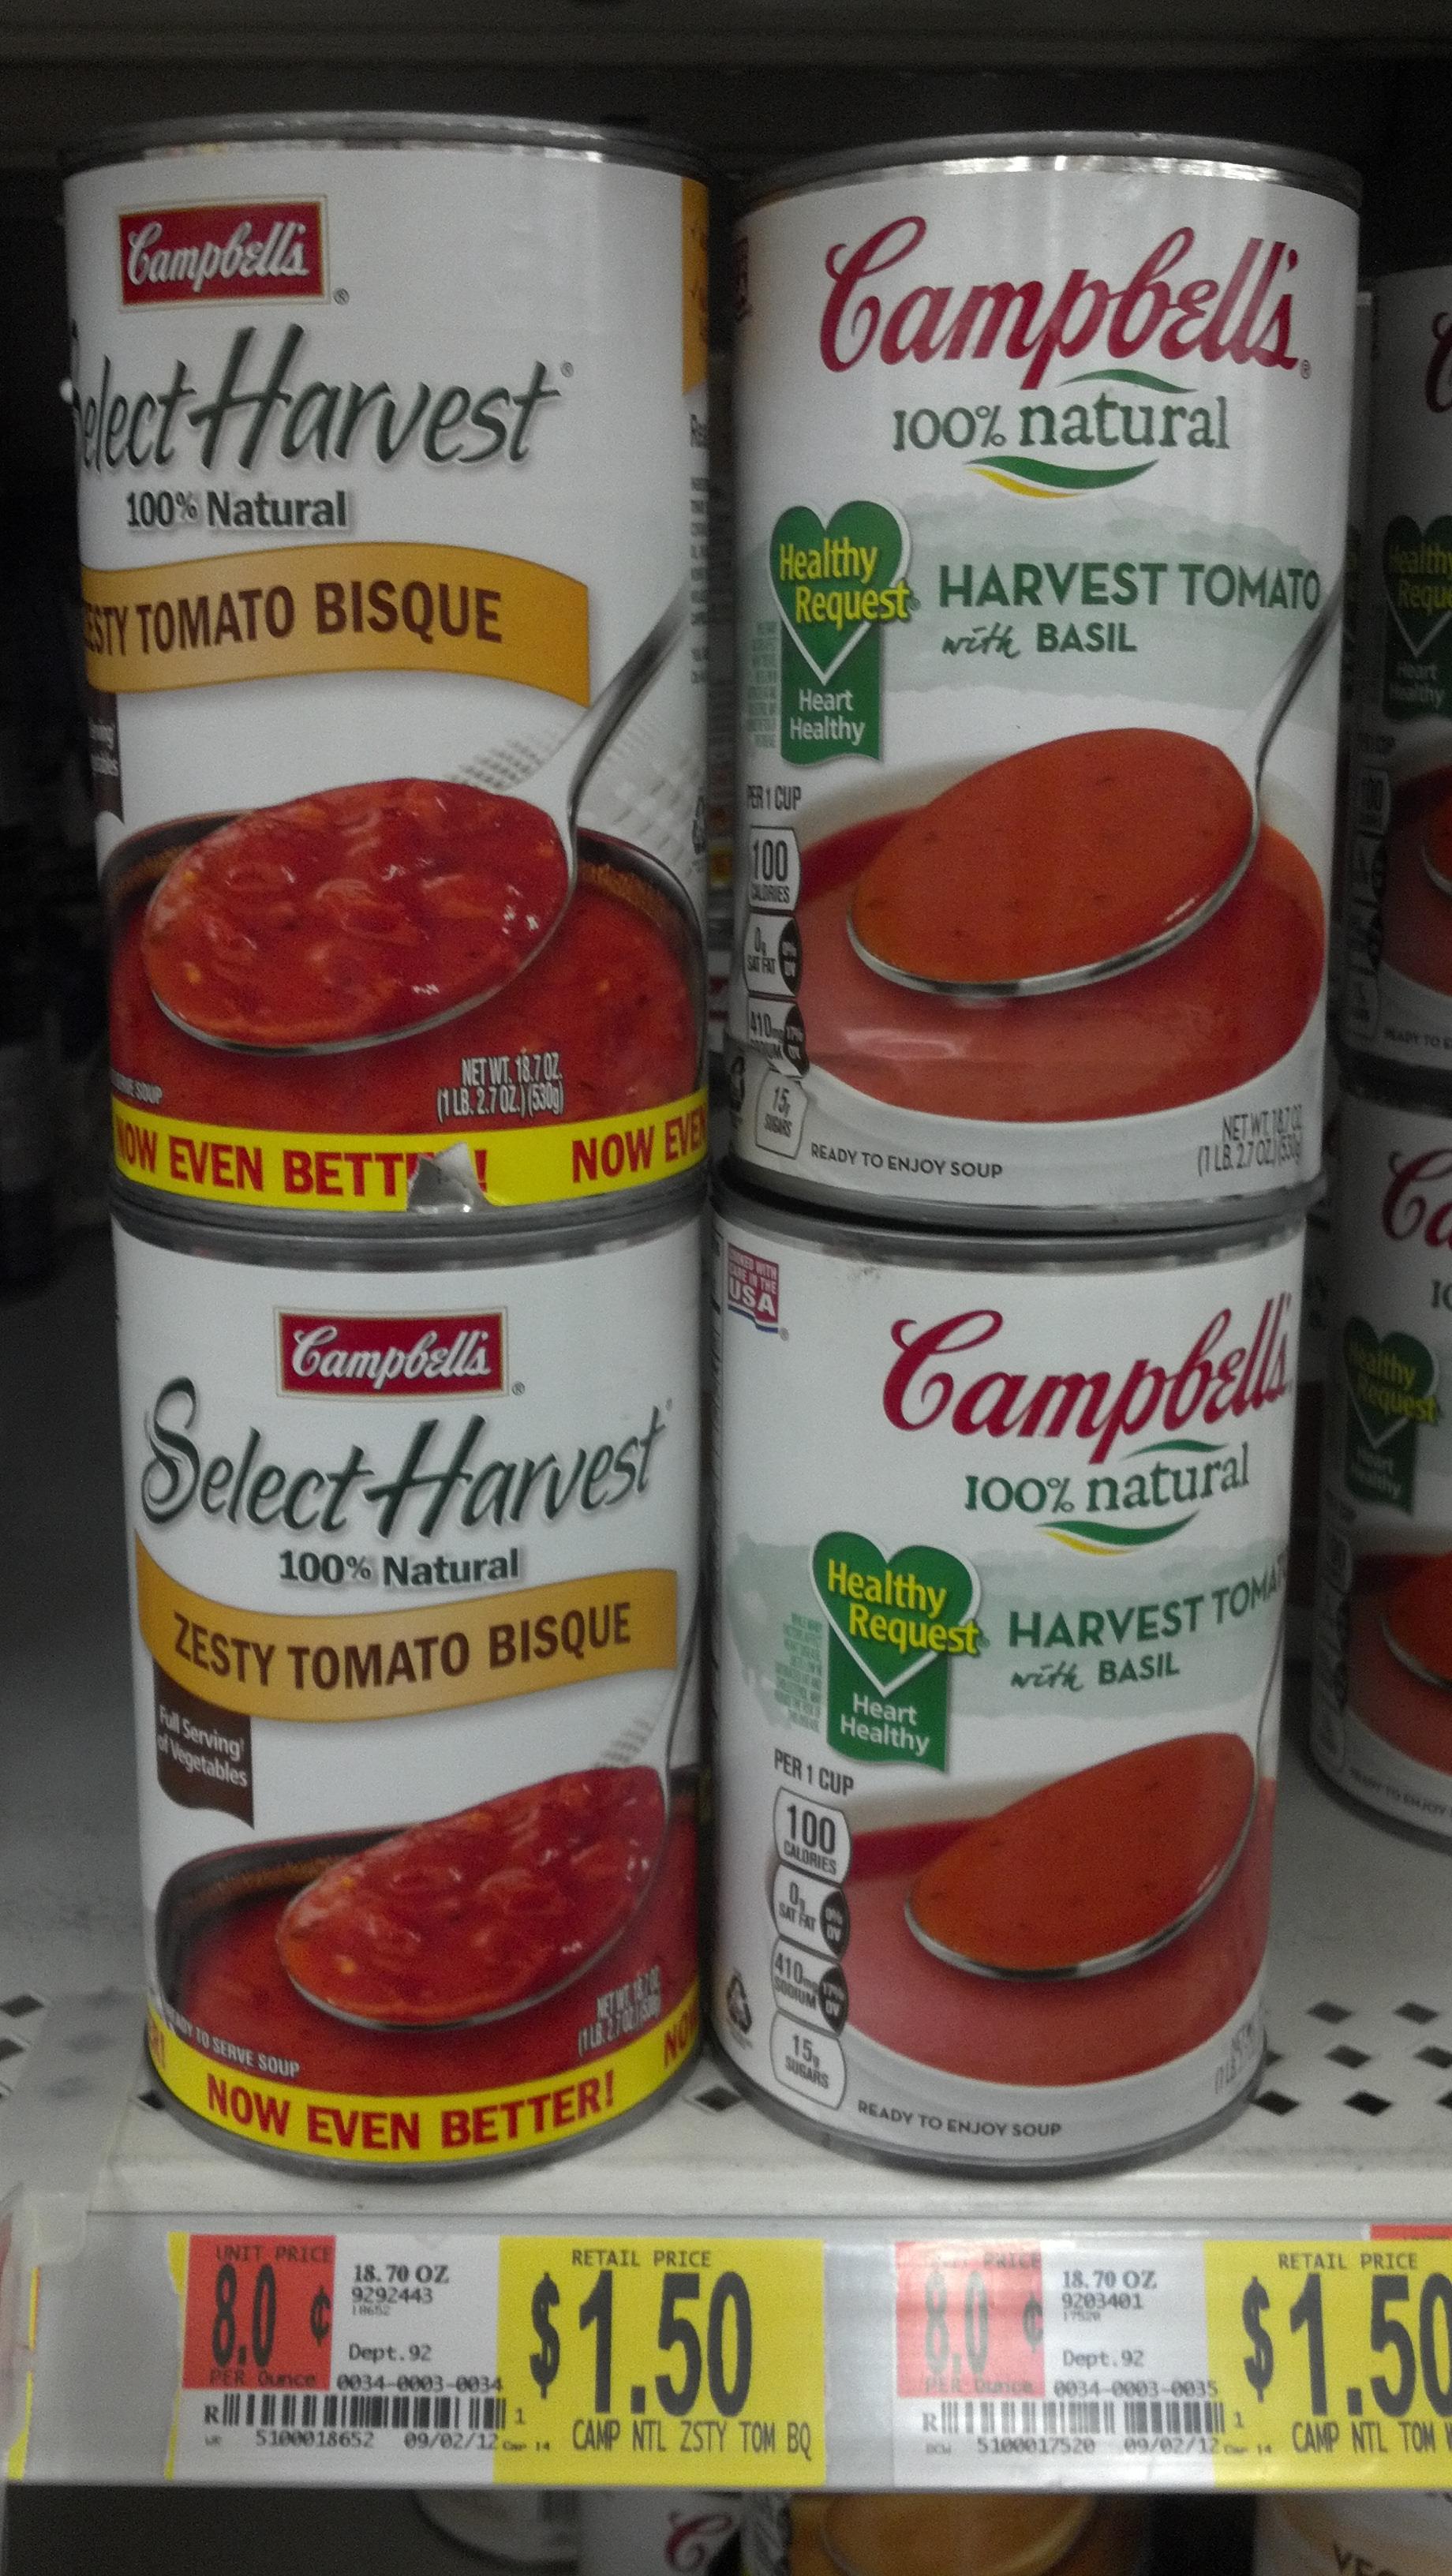 Soup coupons